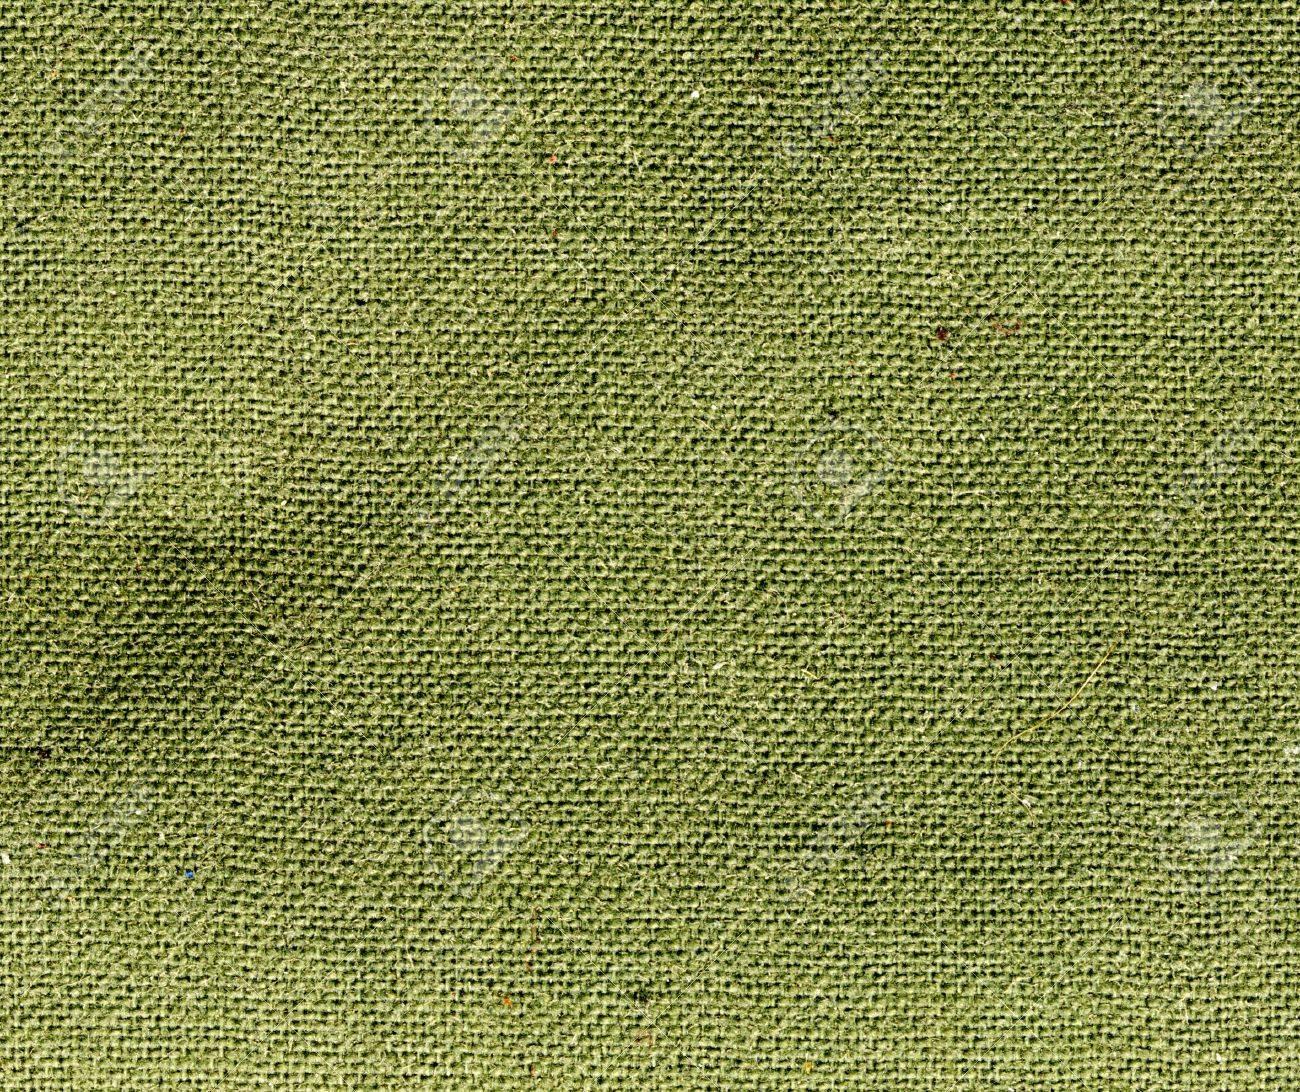 Green Burlap Fabric Texture